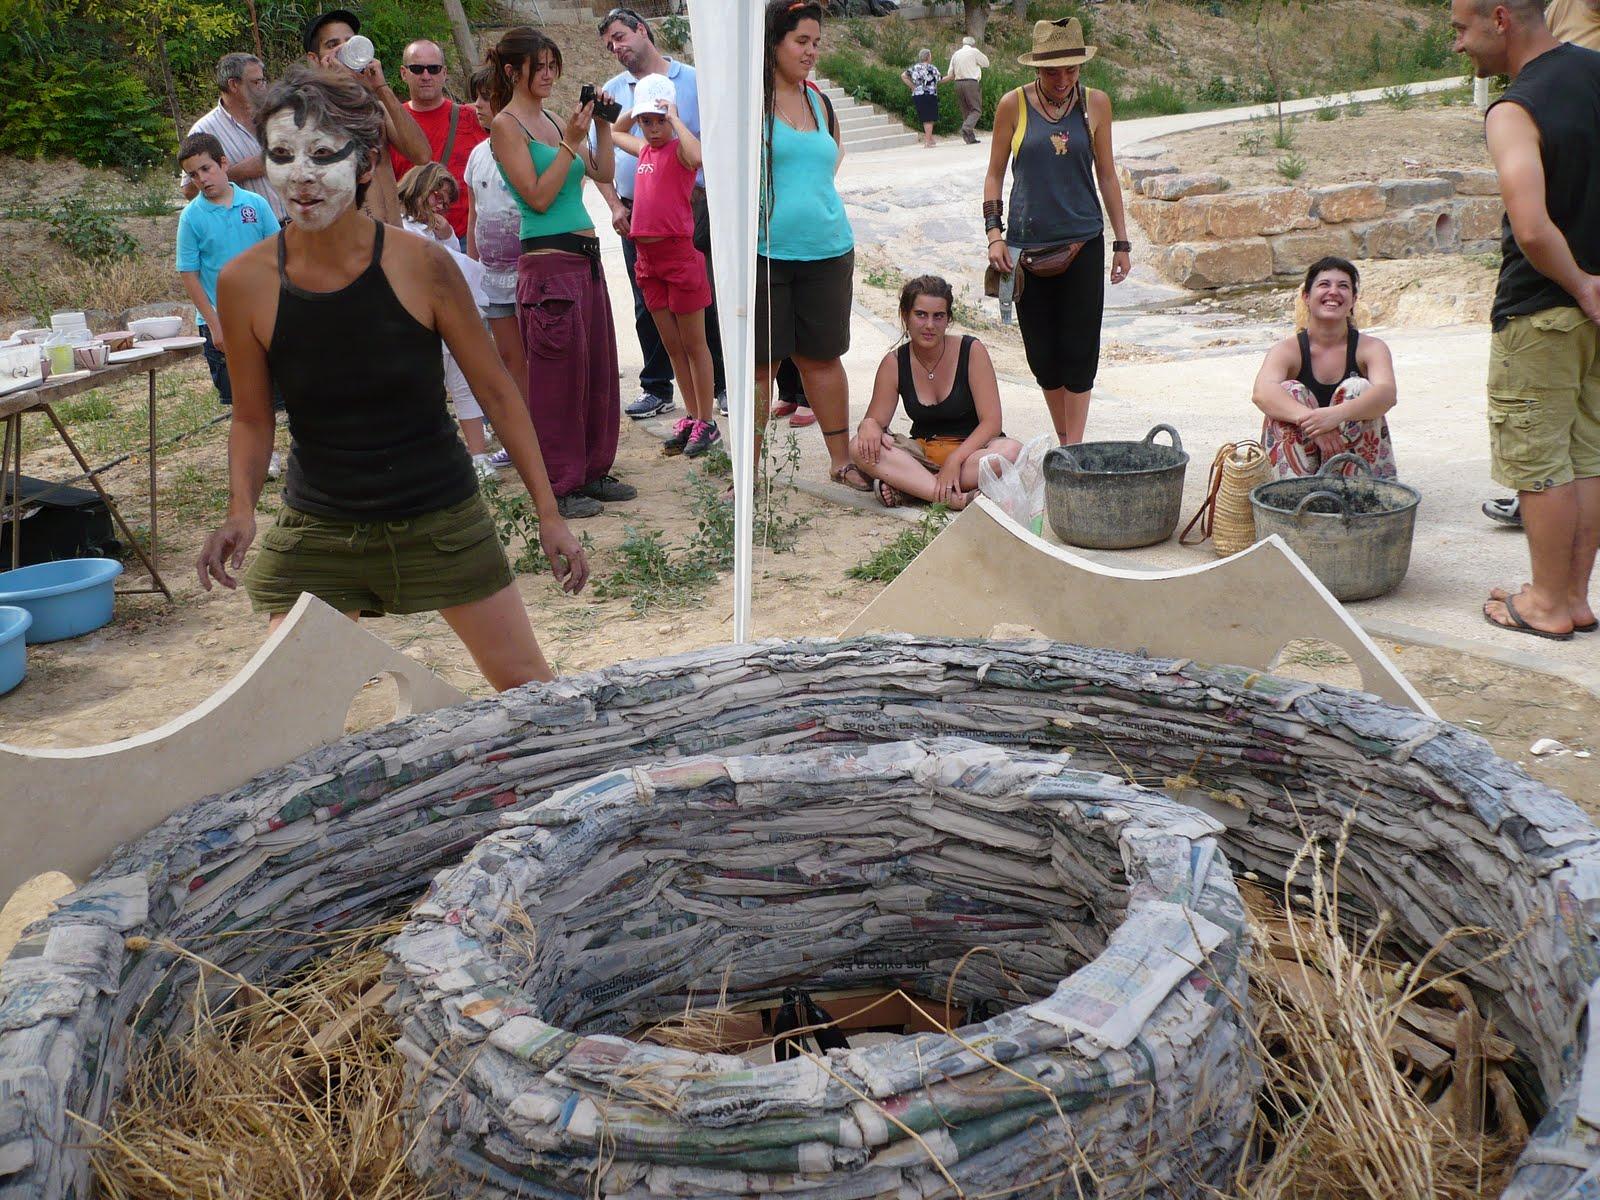 Chisato ceramica curso intensivo de verano for Curso ceramica barcelona